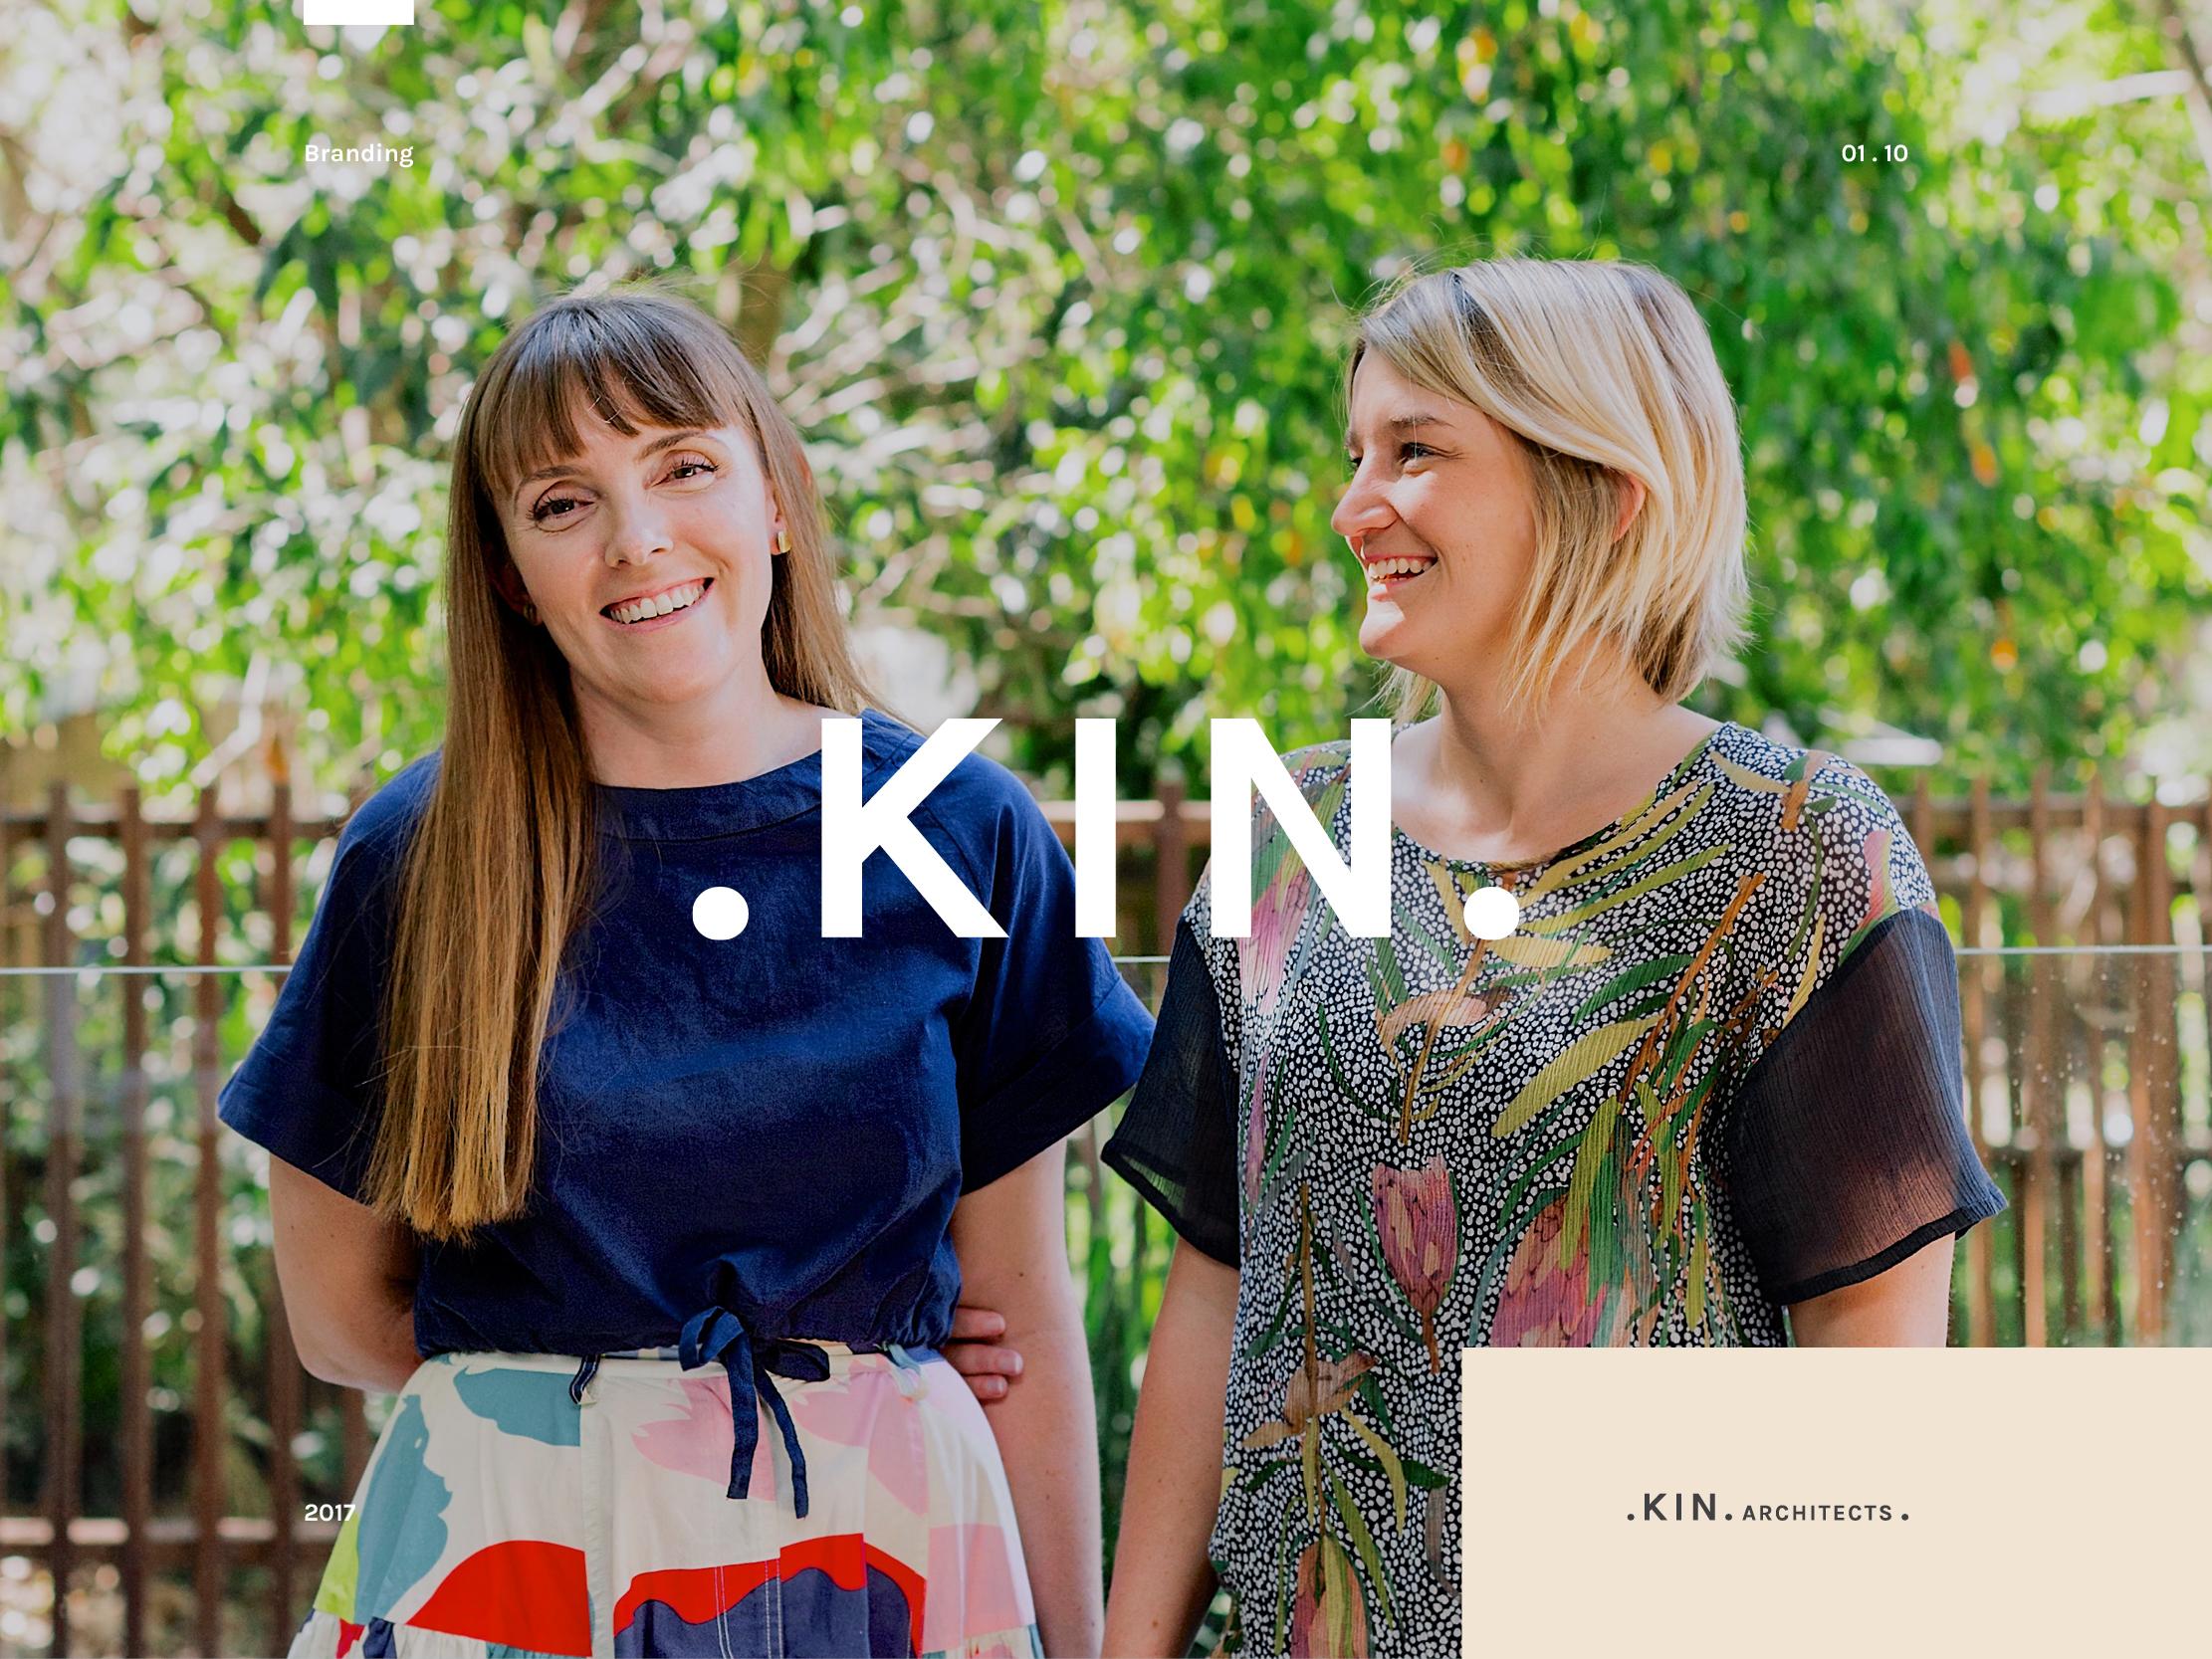 kinarchitects-project-web-1.jpg